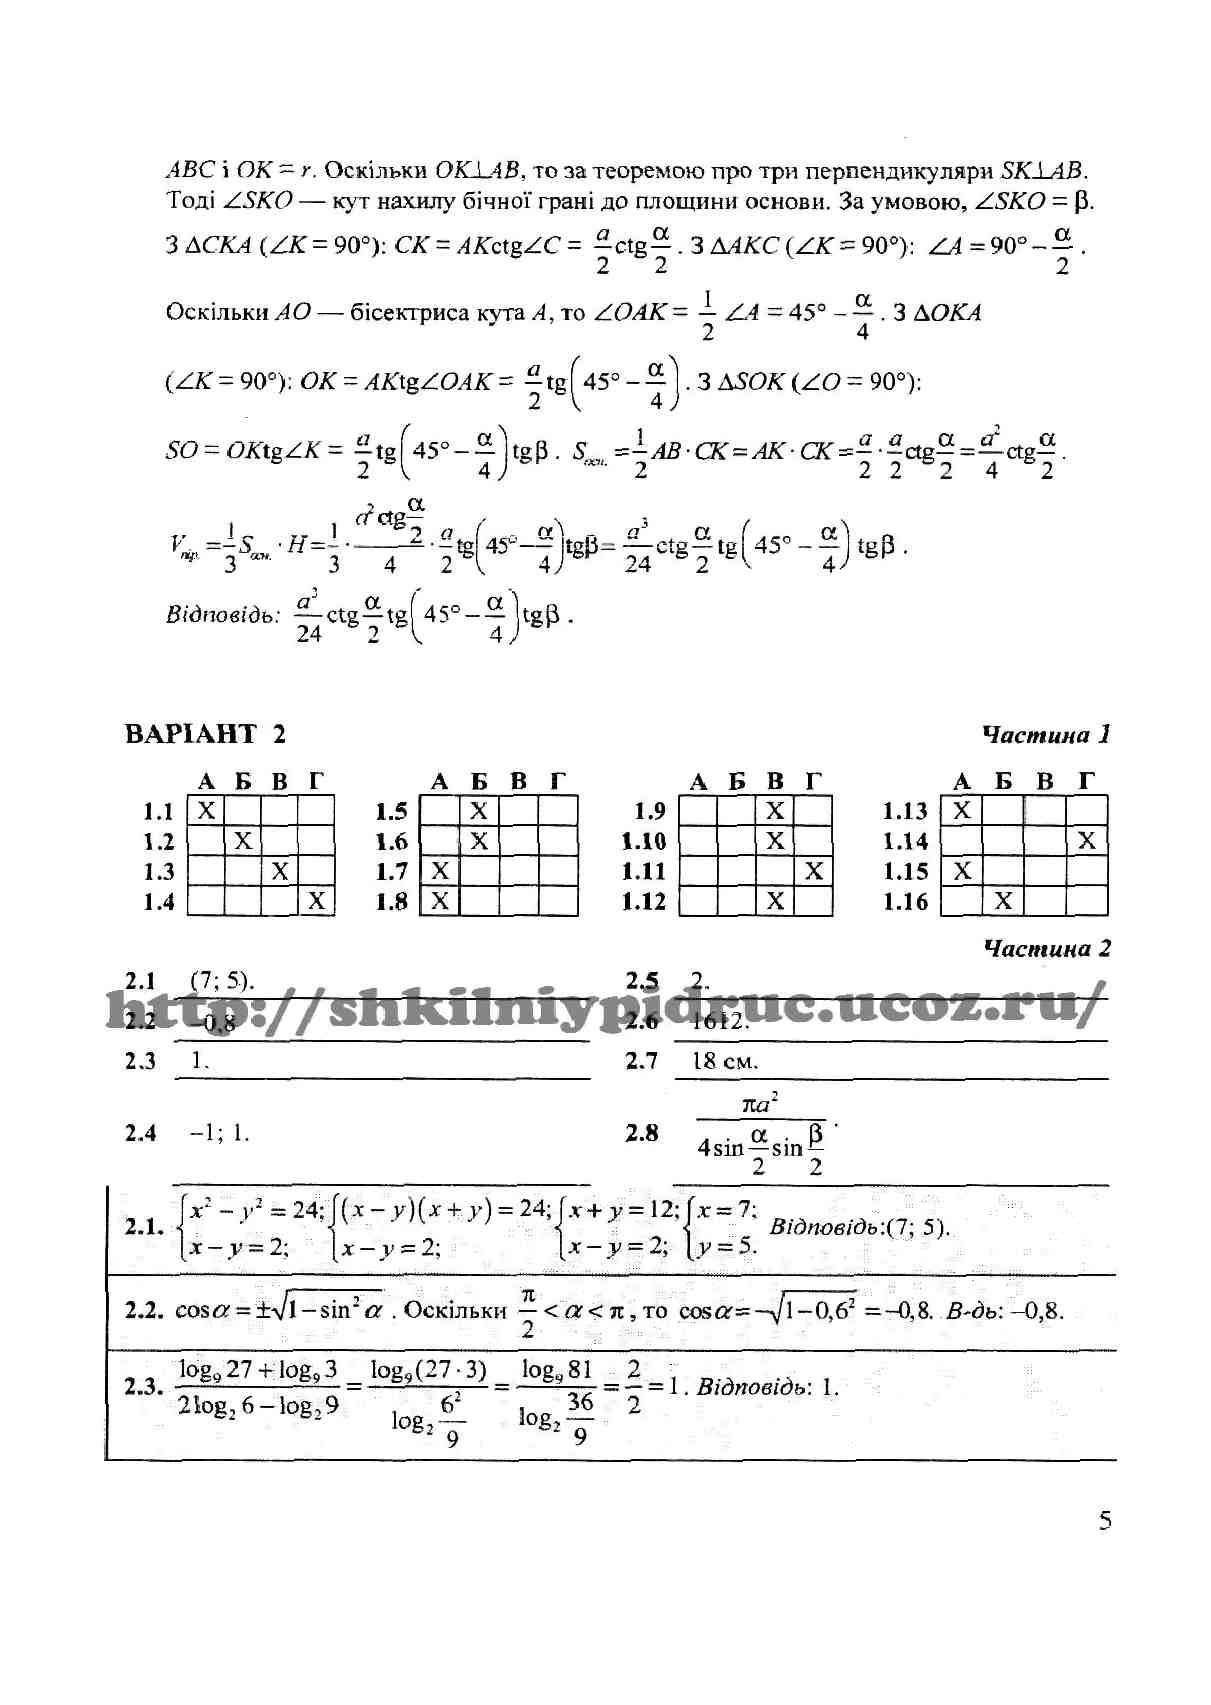 дпа решебник 2014 9 класс математика